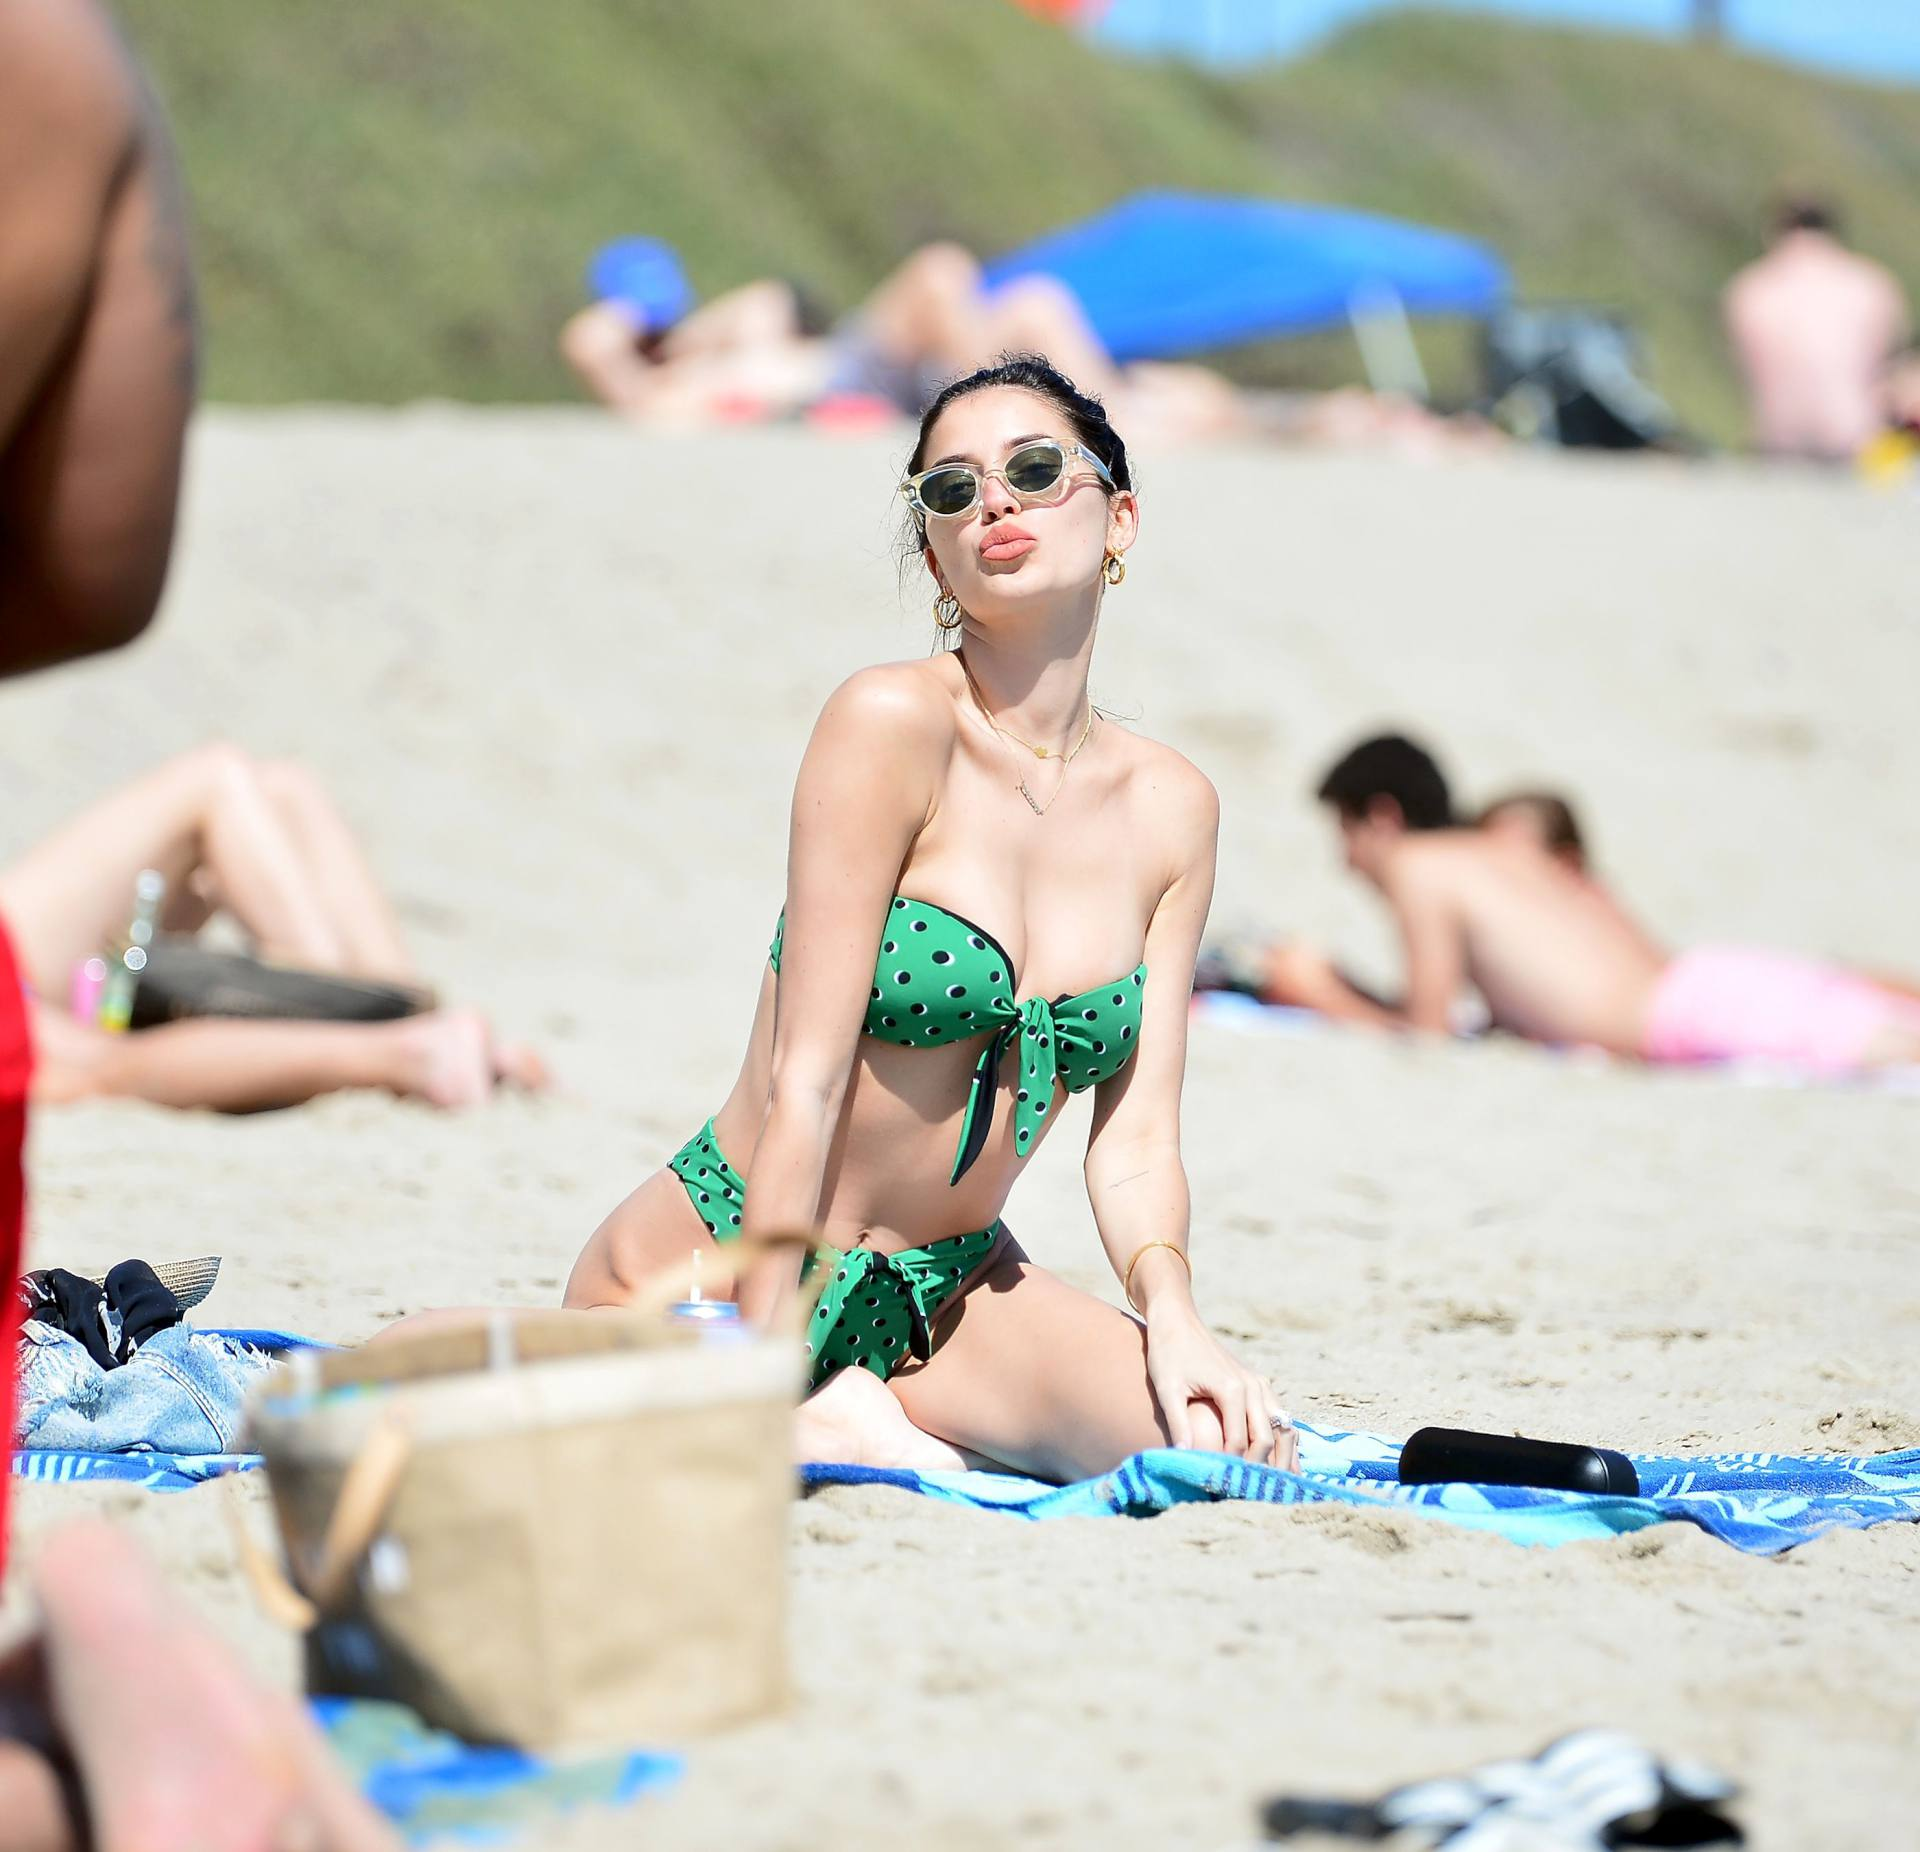 Nicole Williams – Fantastic Body In Skimpy Bikini At The Beach In Malibu 0008